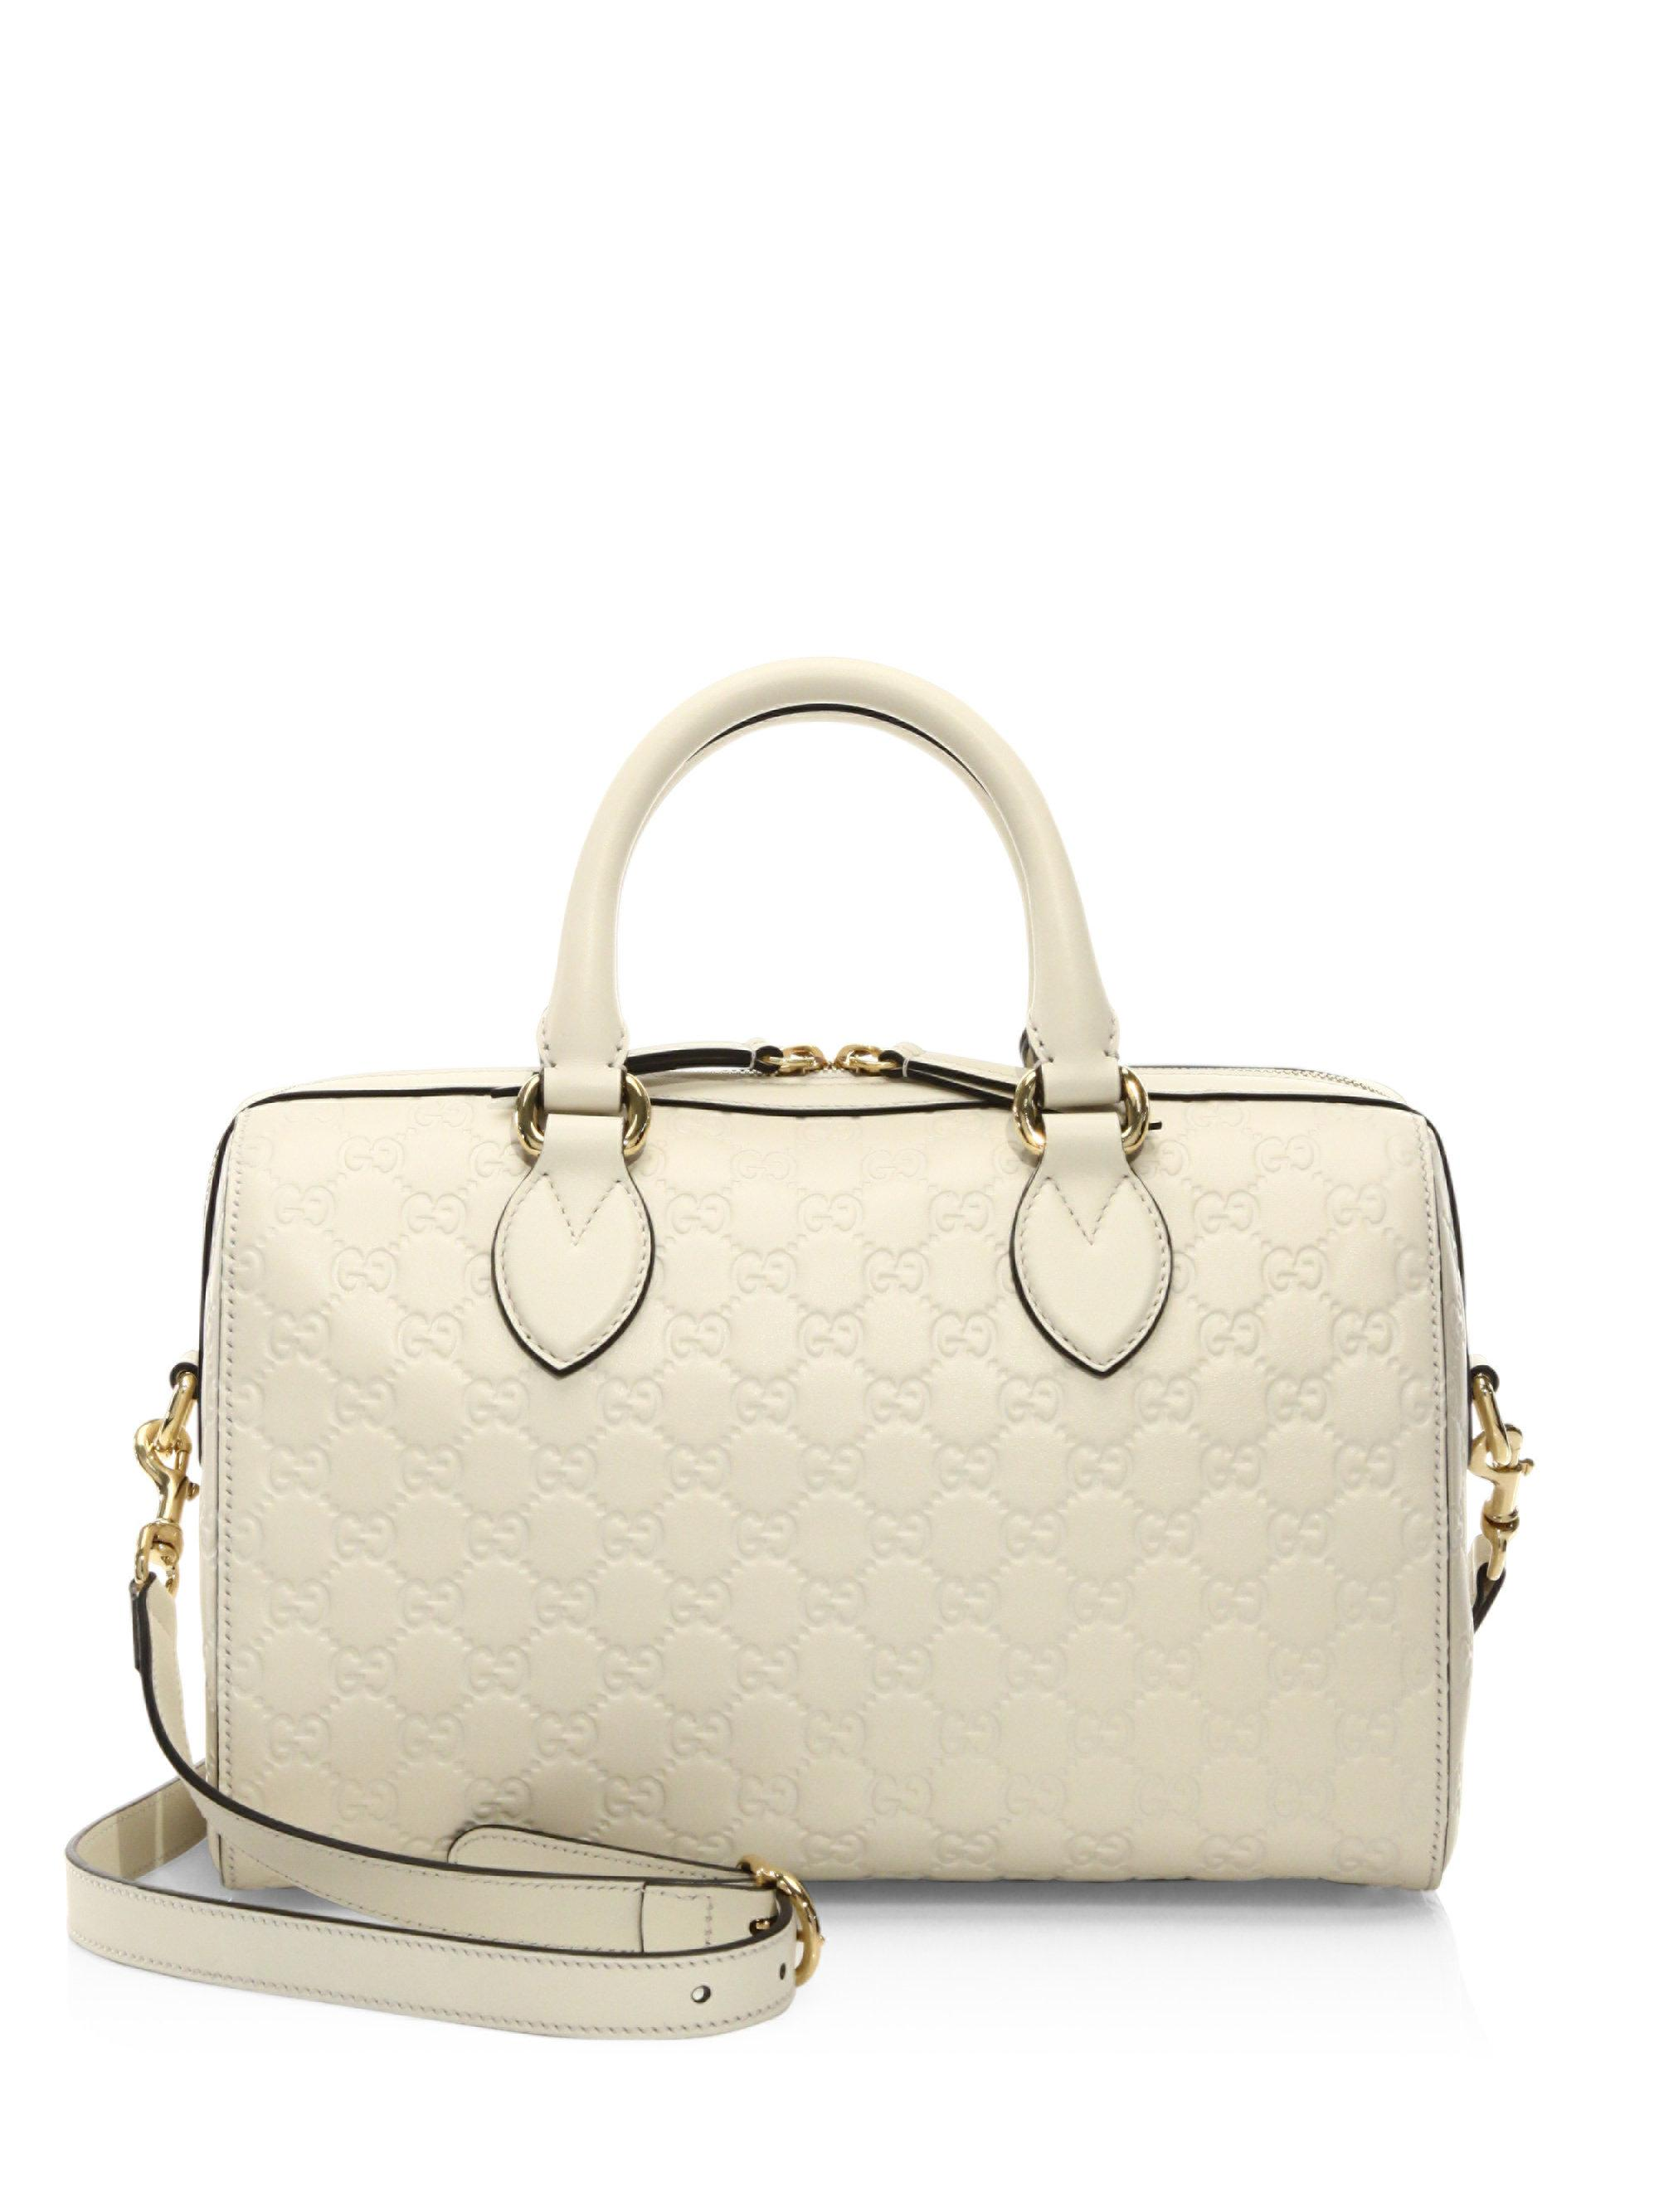 9855bb0a0bda Gucci Medium Soft Signature Leather Boston Bag in White - Lyst